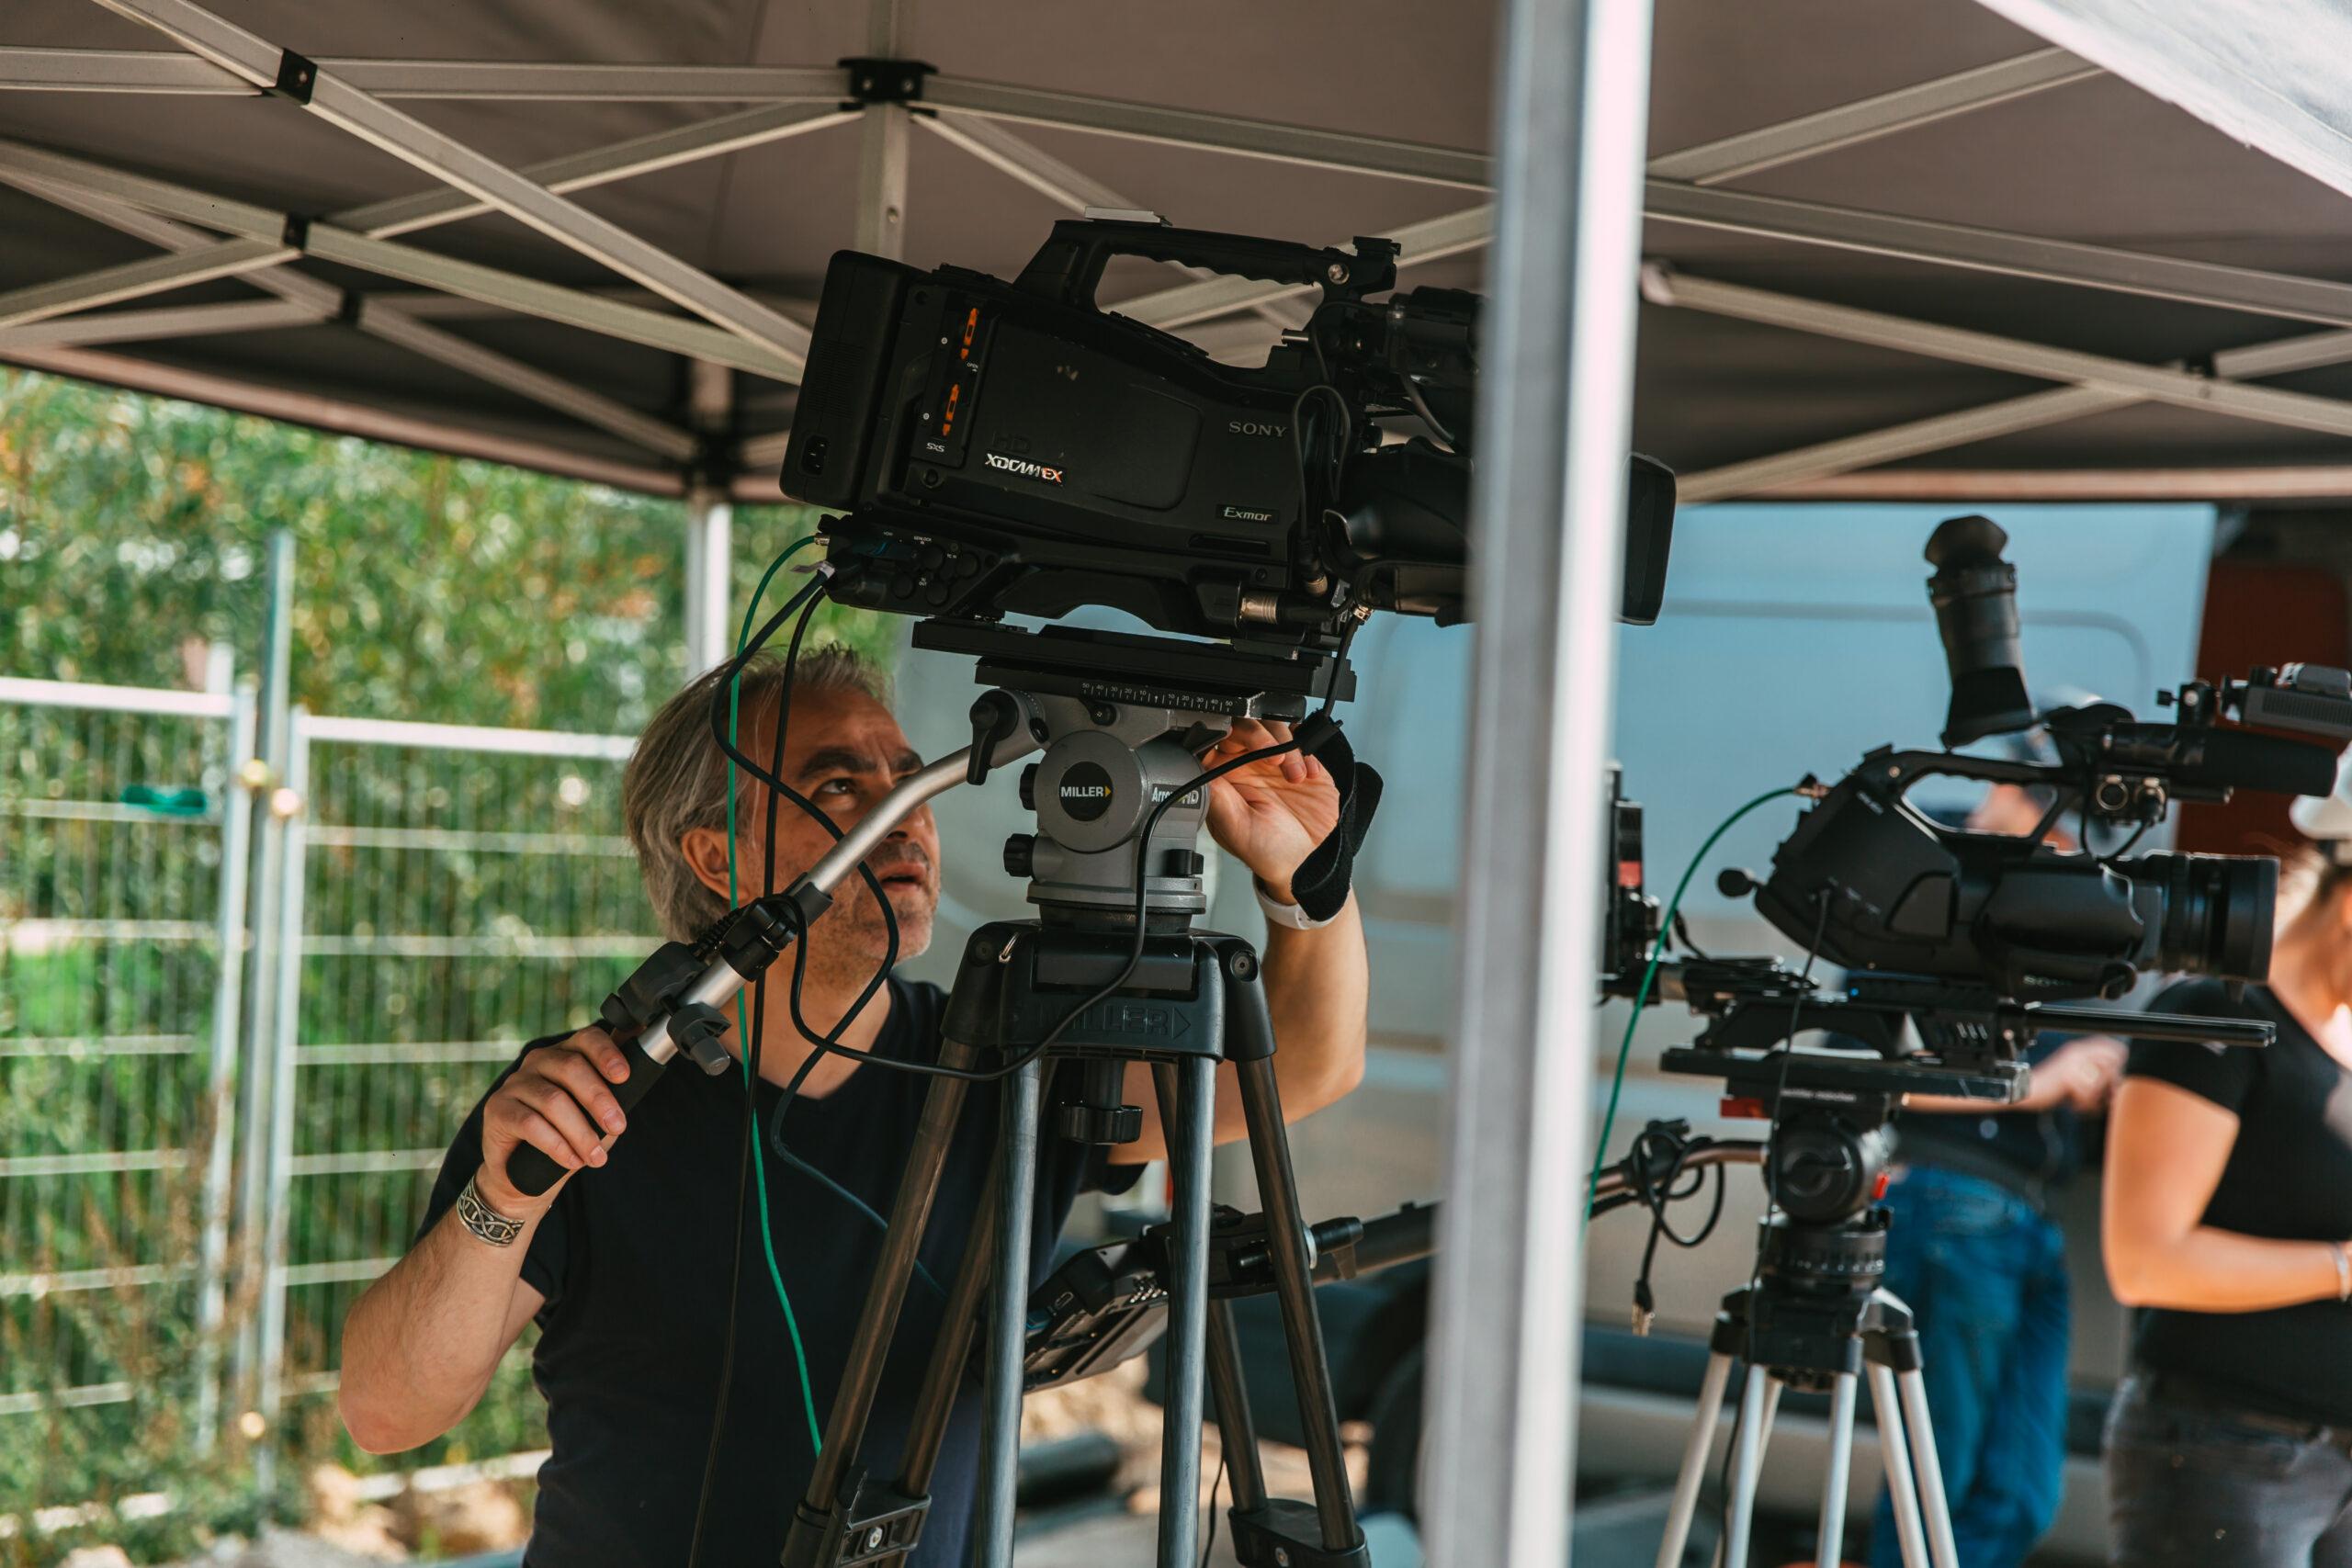 Cameraman 20one